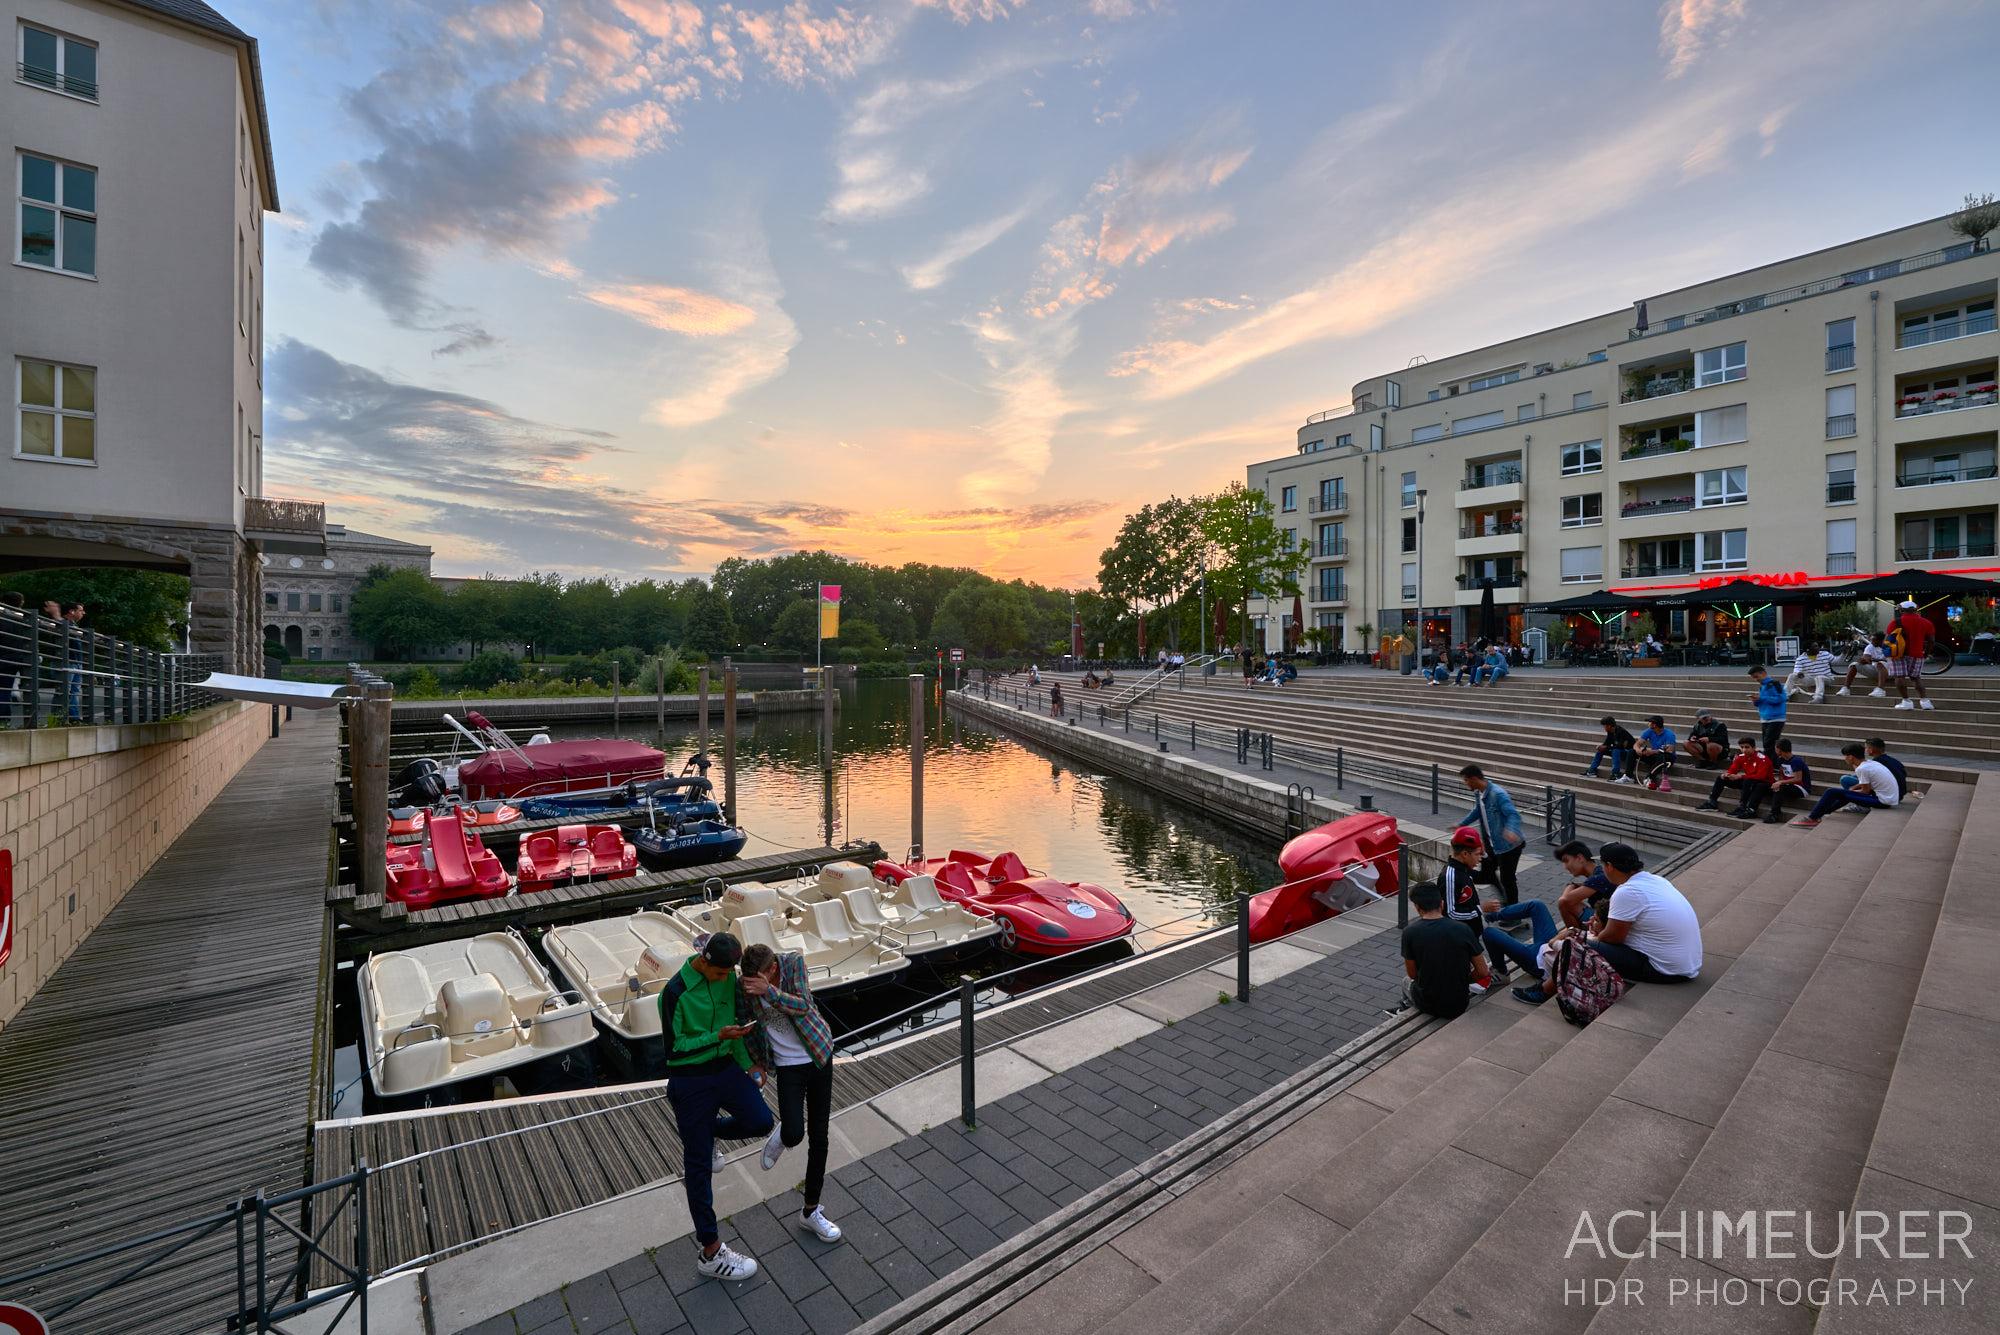 Sonnenuntergang - Impressionen aus Mülheim a.d. Ruhr, Ruhrgebiet , NRW by AchimMeurer.com .